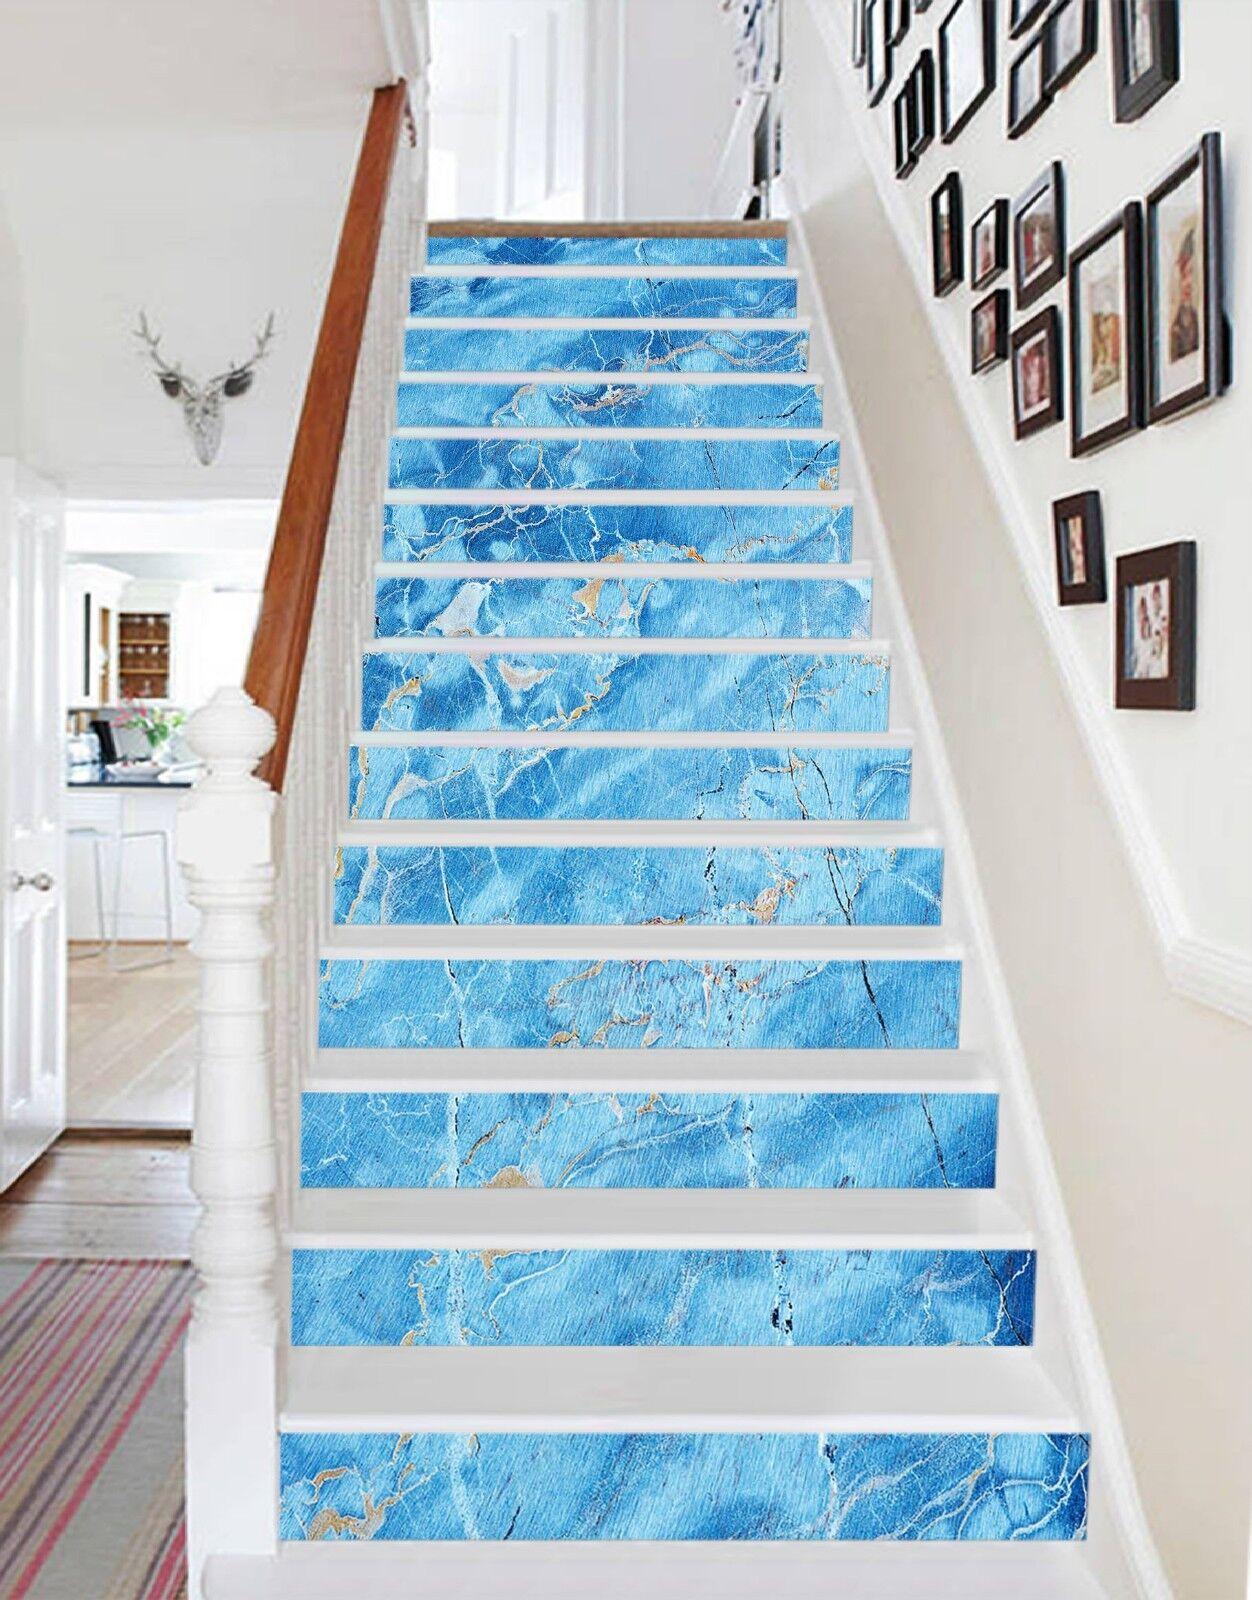 3D blue Riss 82 Fliese Marmor Stair Risers Fototapete Vinyl Aufkleber Tapete